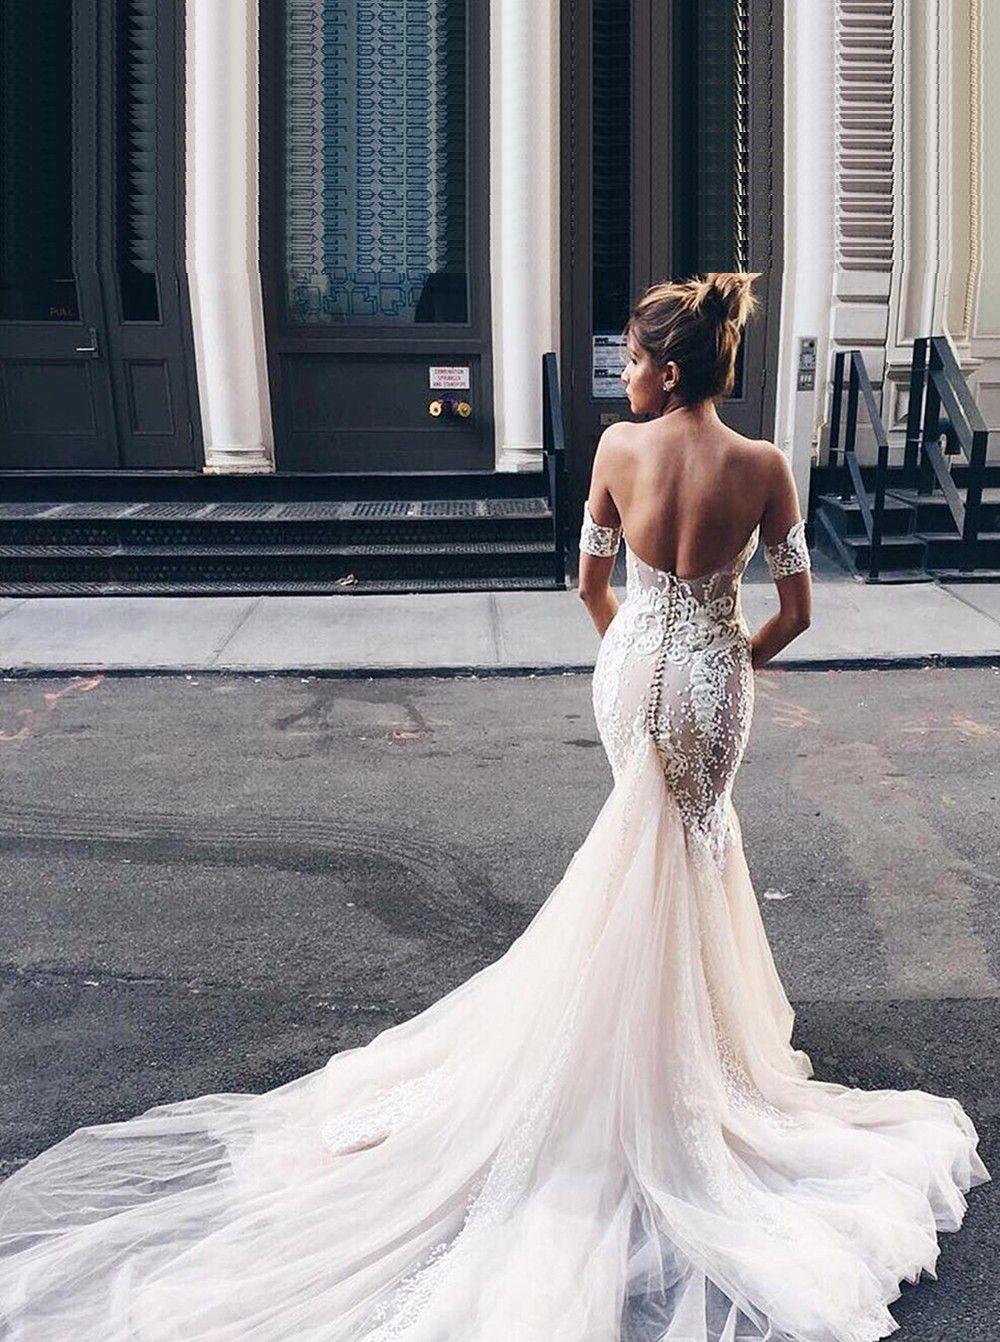 Blush mermaid wedding dress  Stylish Sweetheart Watteau Train Blush Mermaid Wedding Dress with